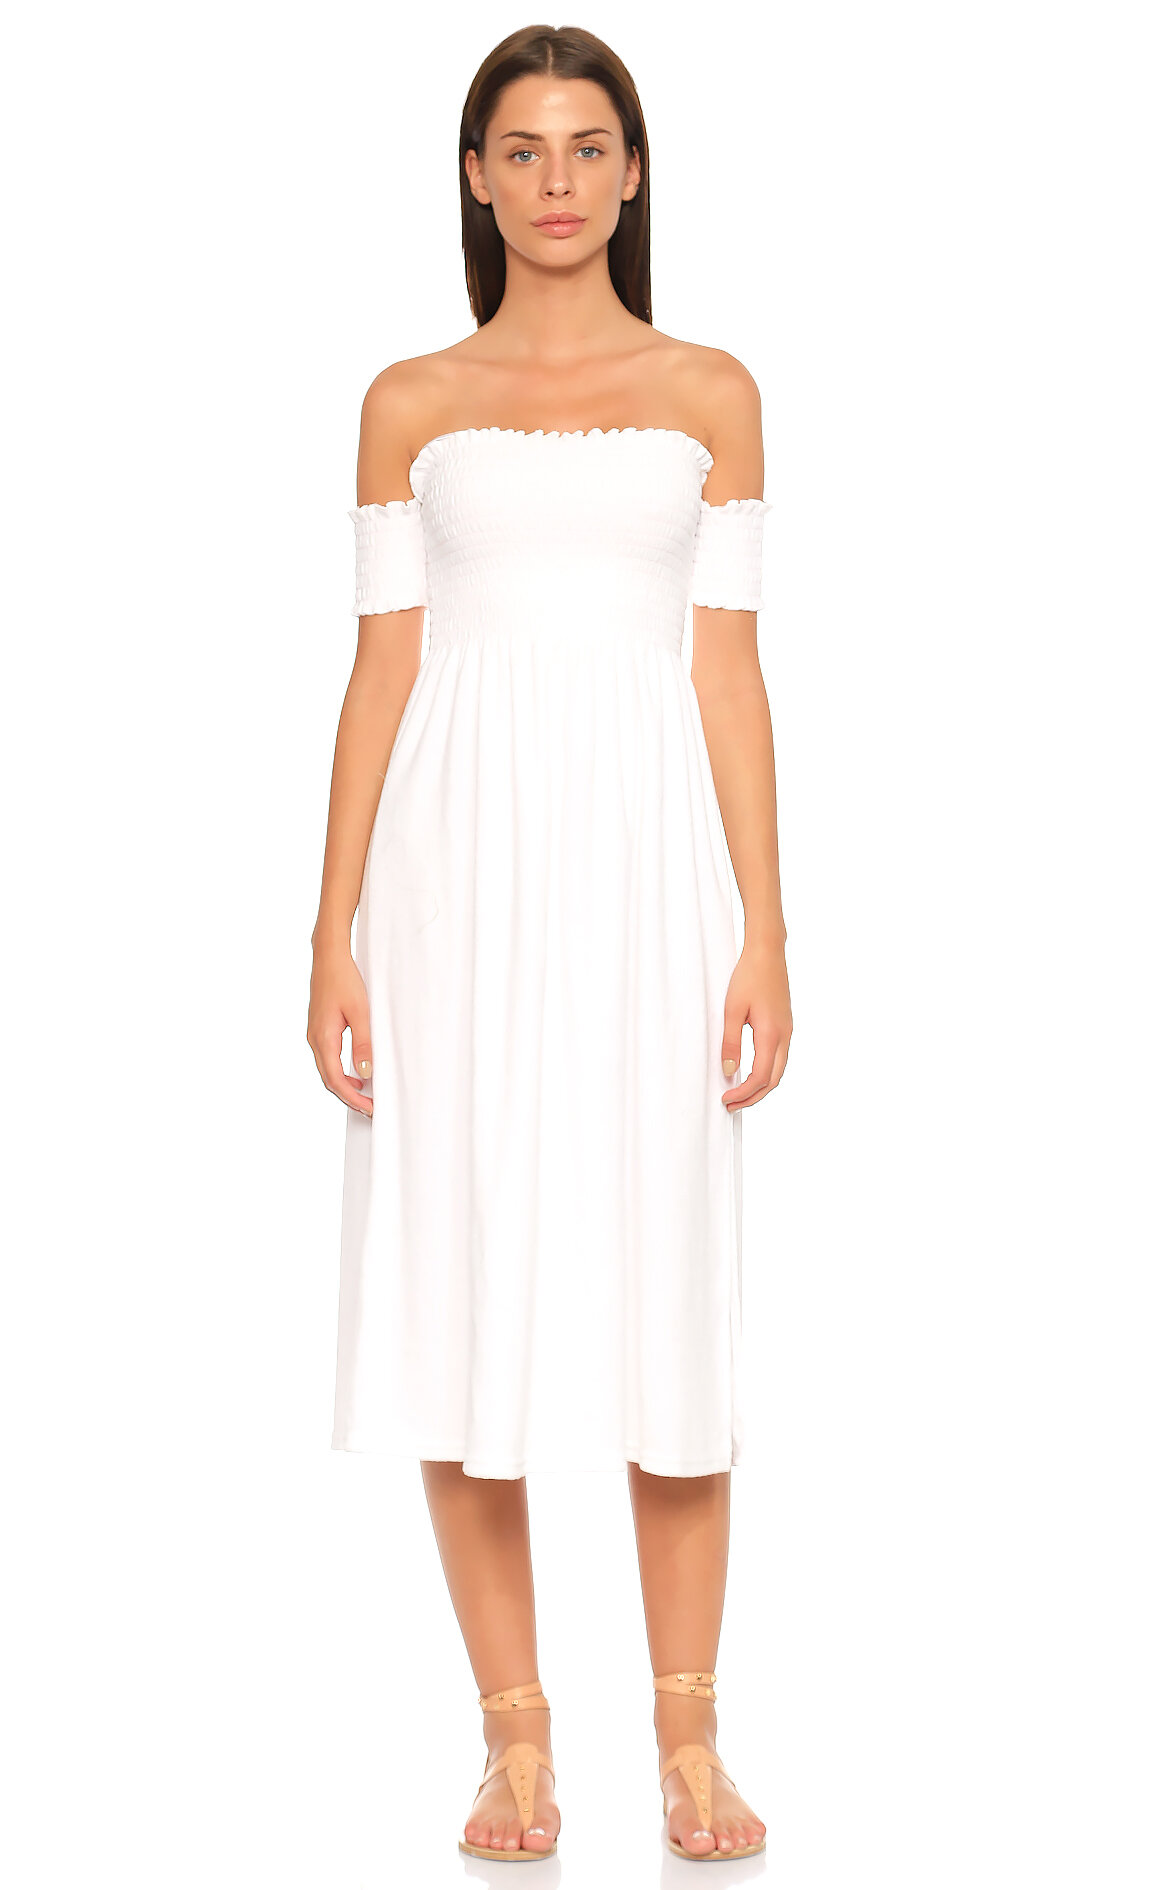 Juicy Couture-Juicy Couture Kayık Yaka Midi Beyaz Elbise